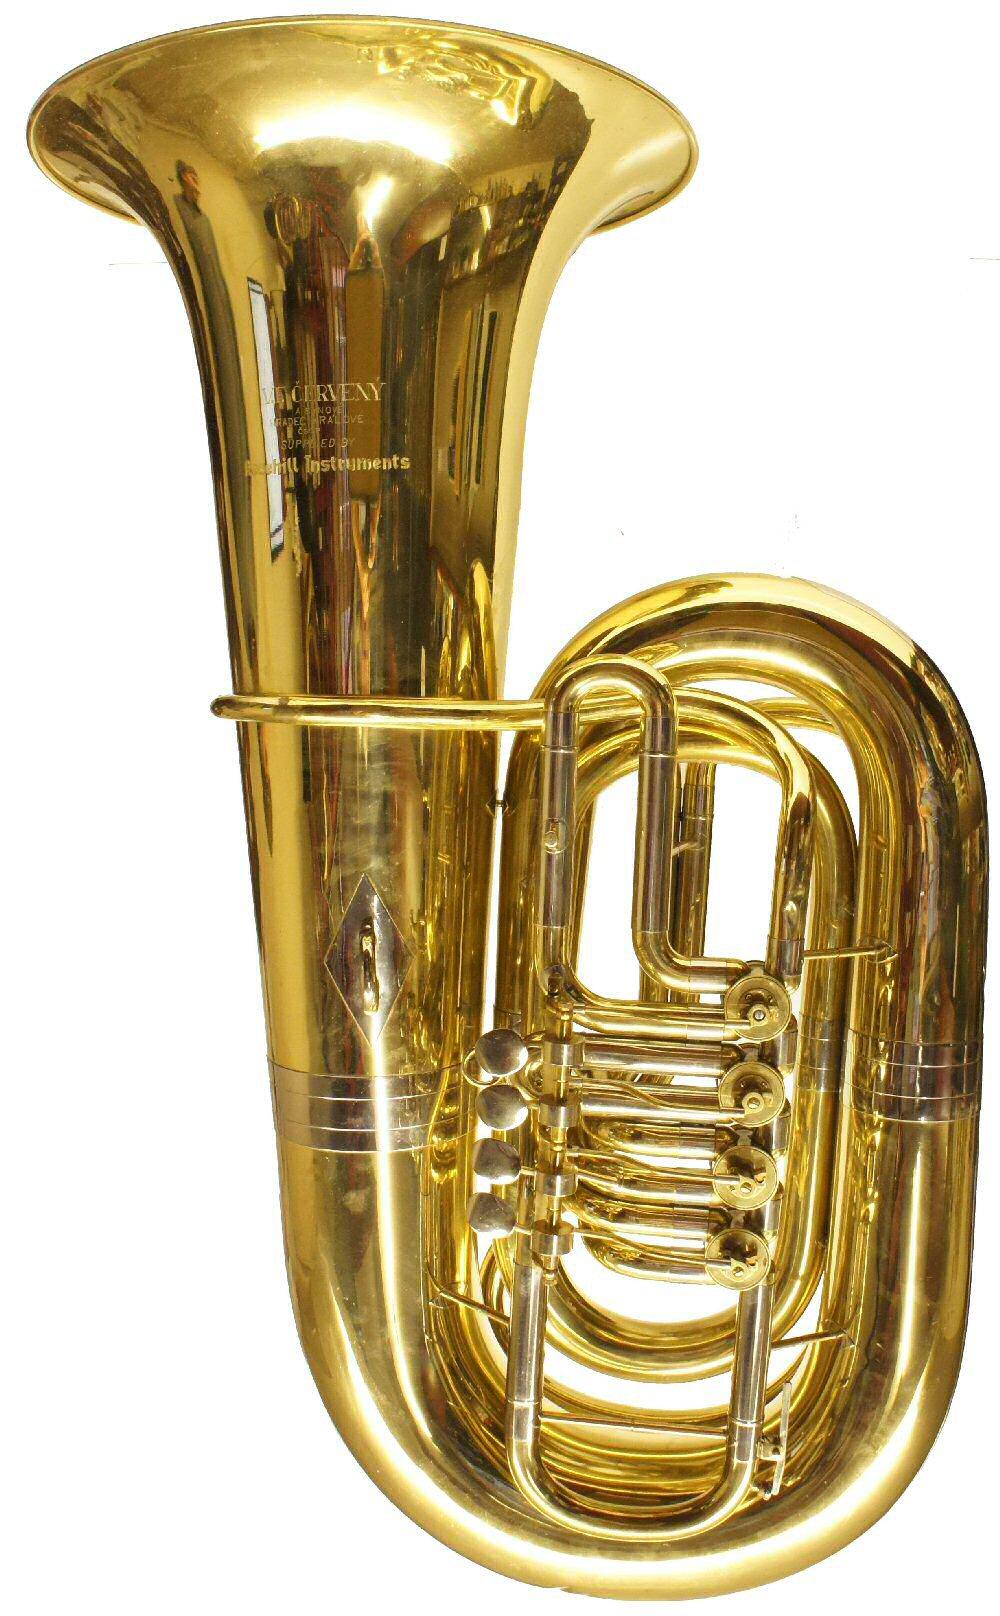 Second Hand Cerveny 4 Valve C Tuba